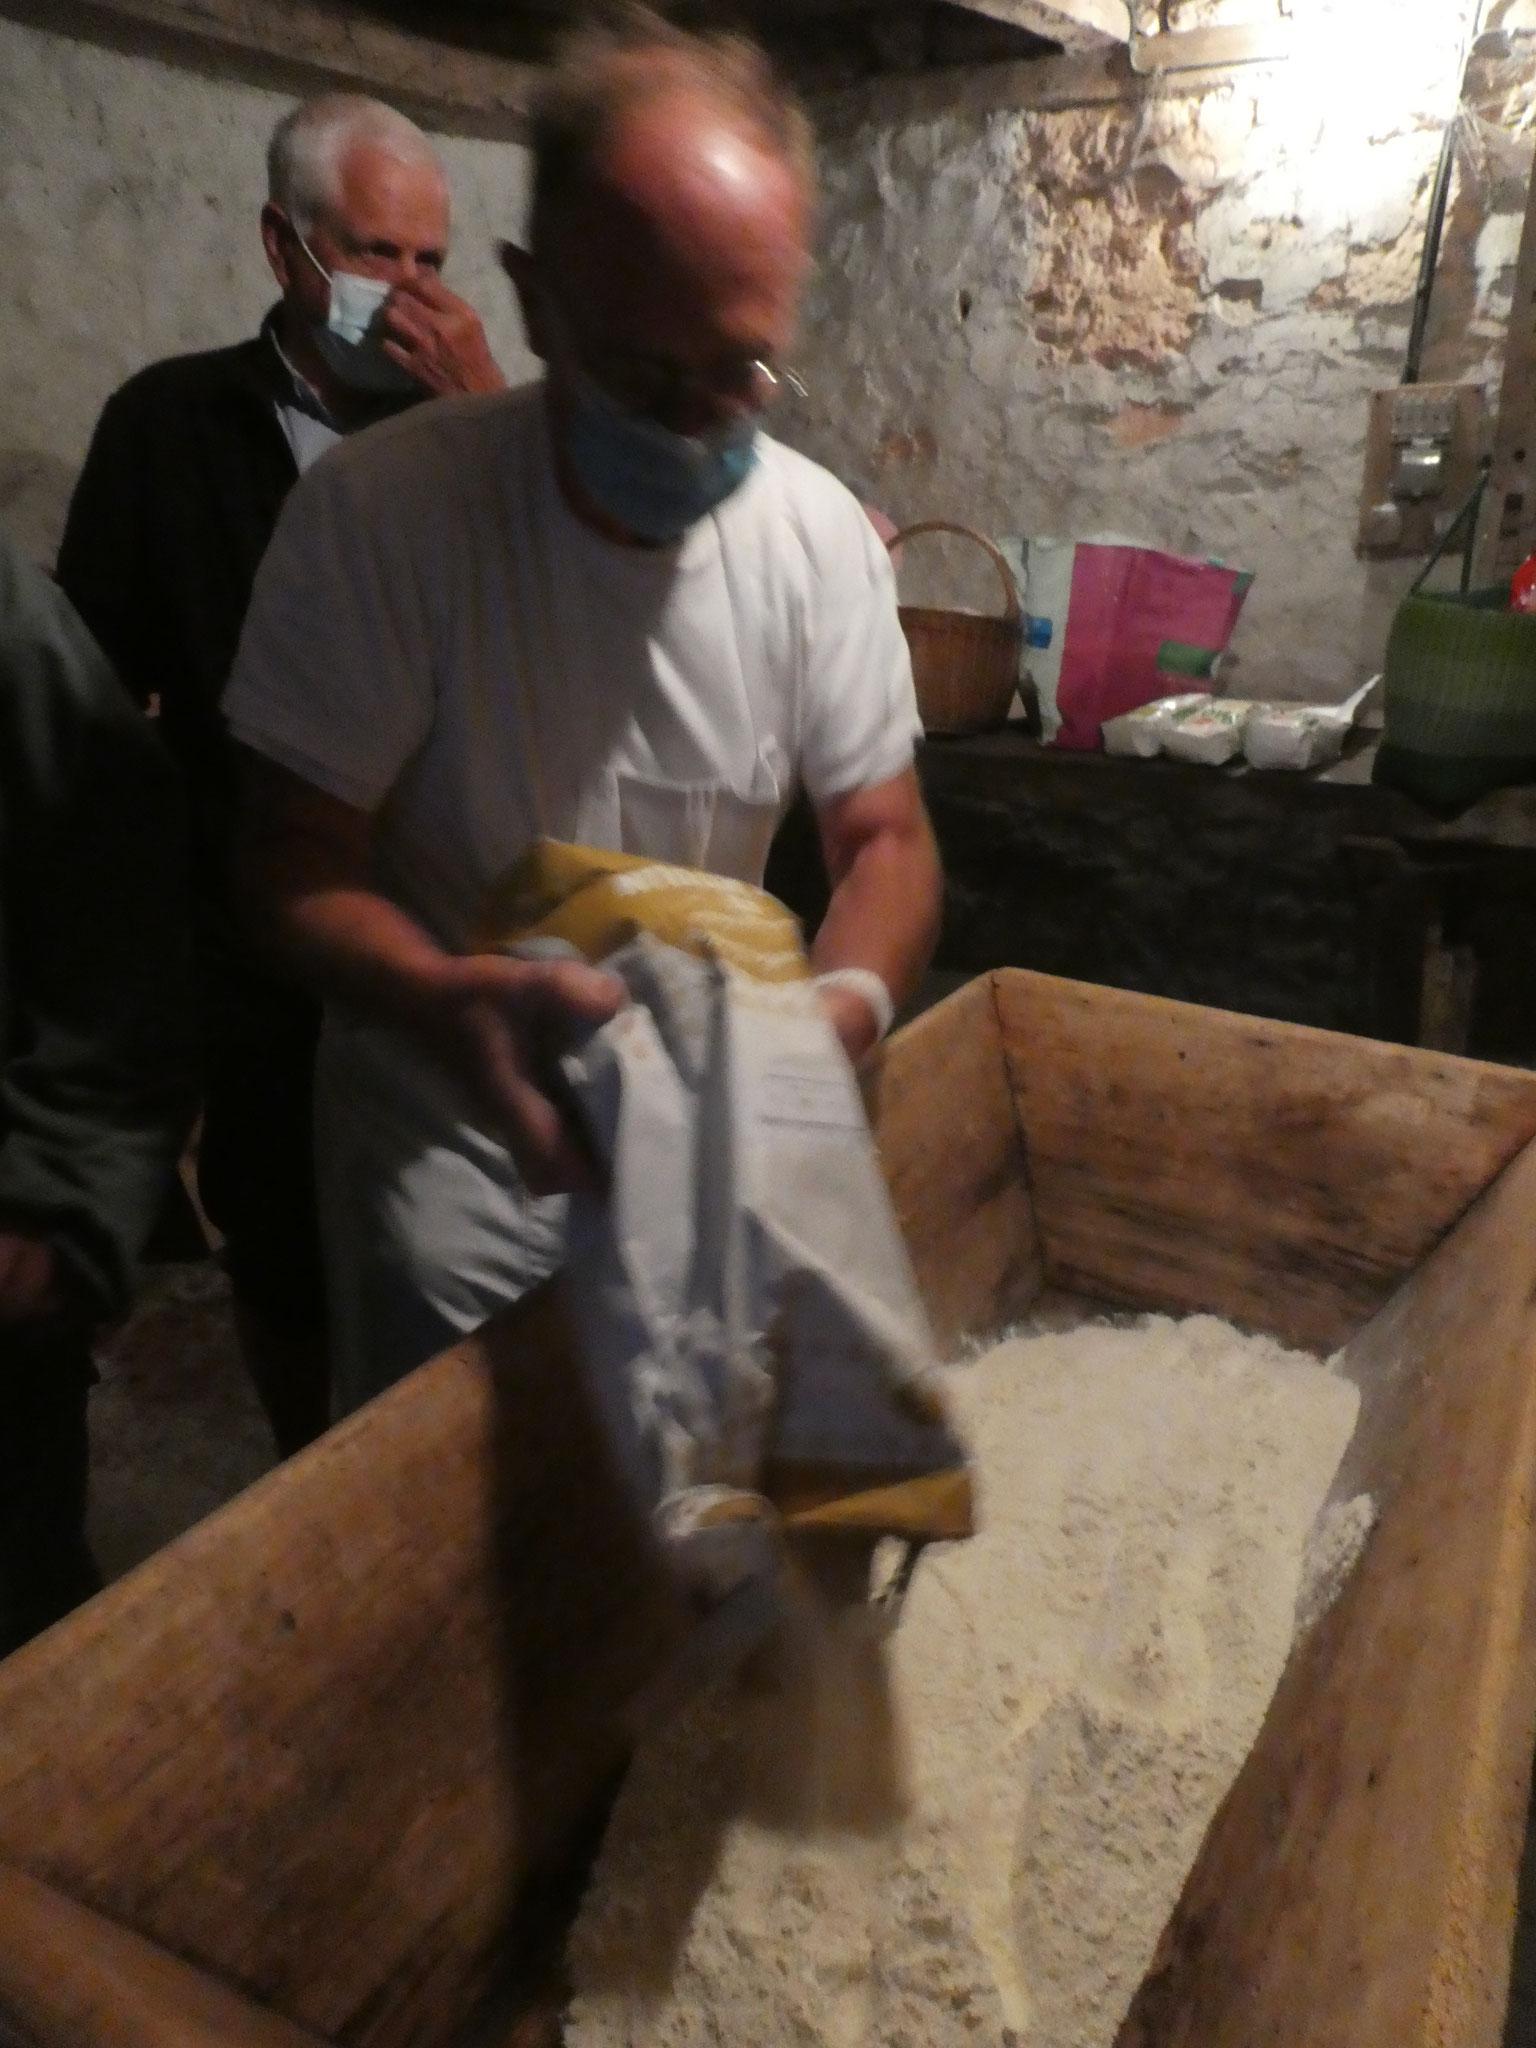 La fabrication de la pâte commence